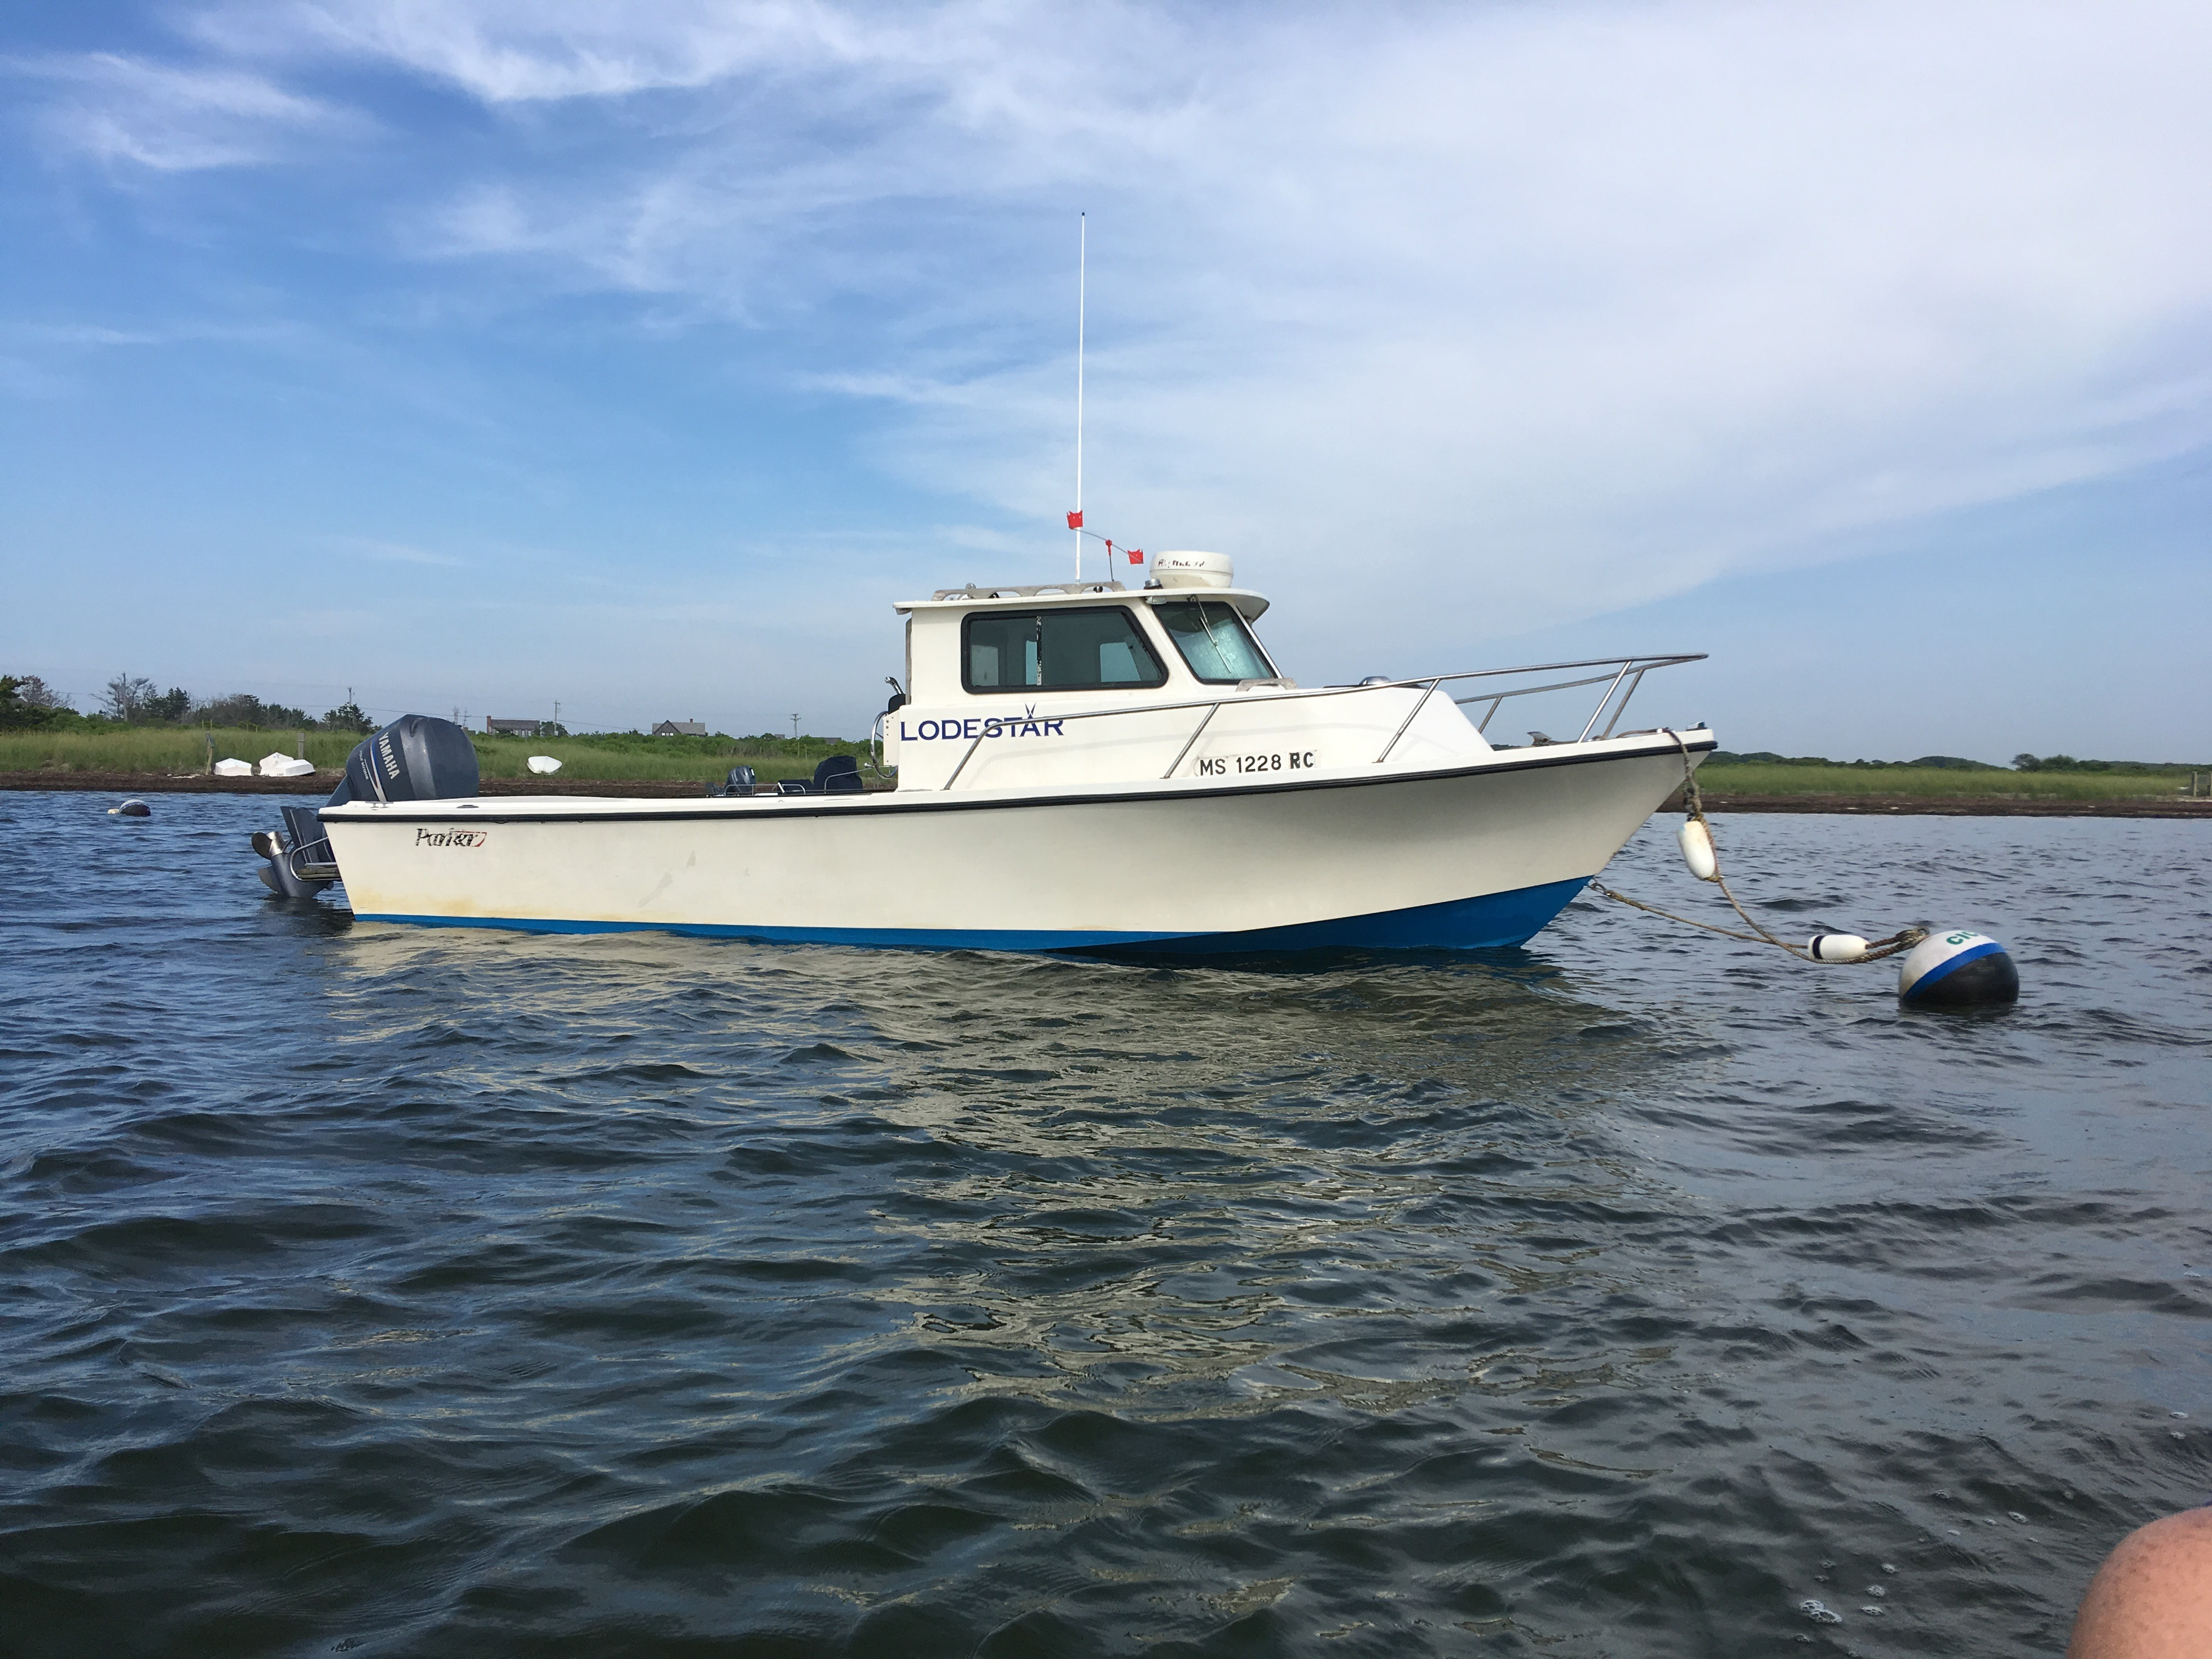 Parker boats for sale in Massachusetts - Boat Trader